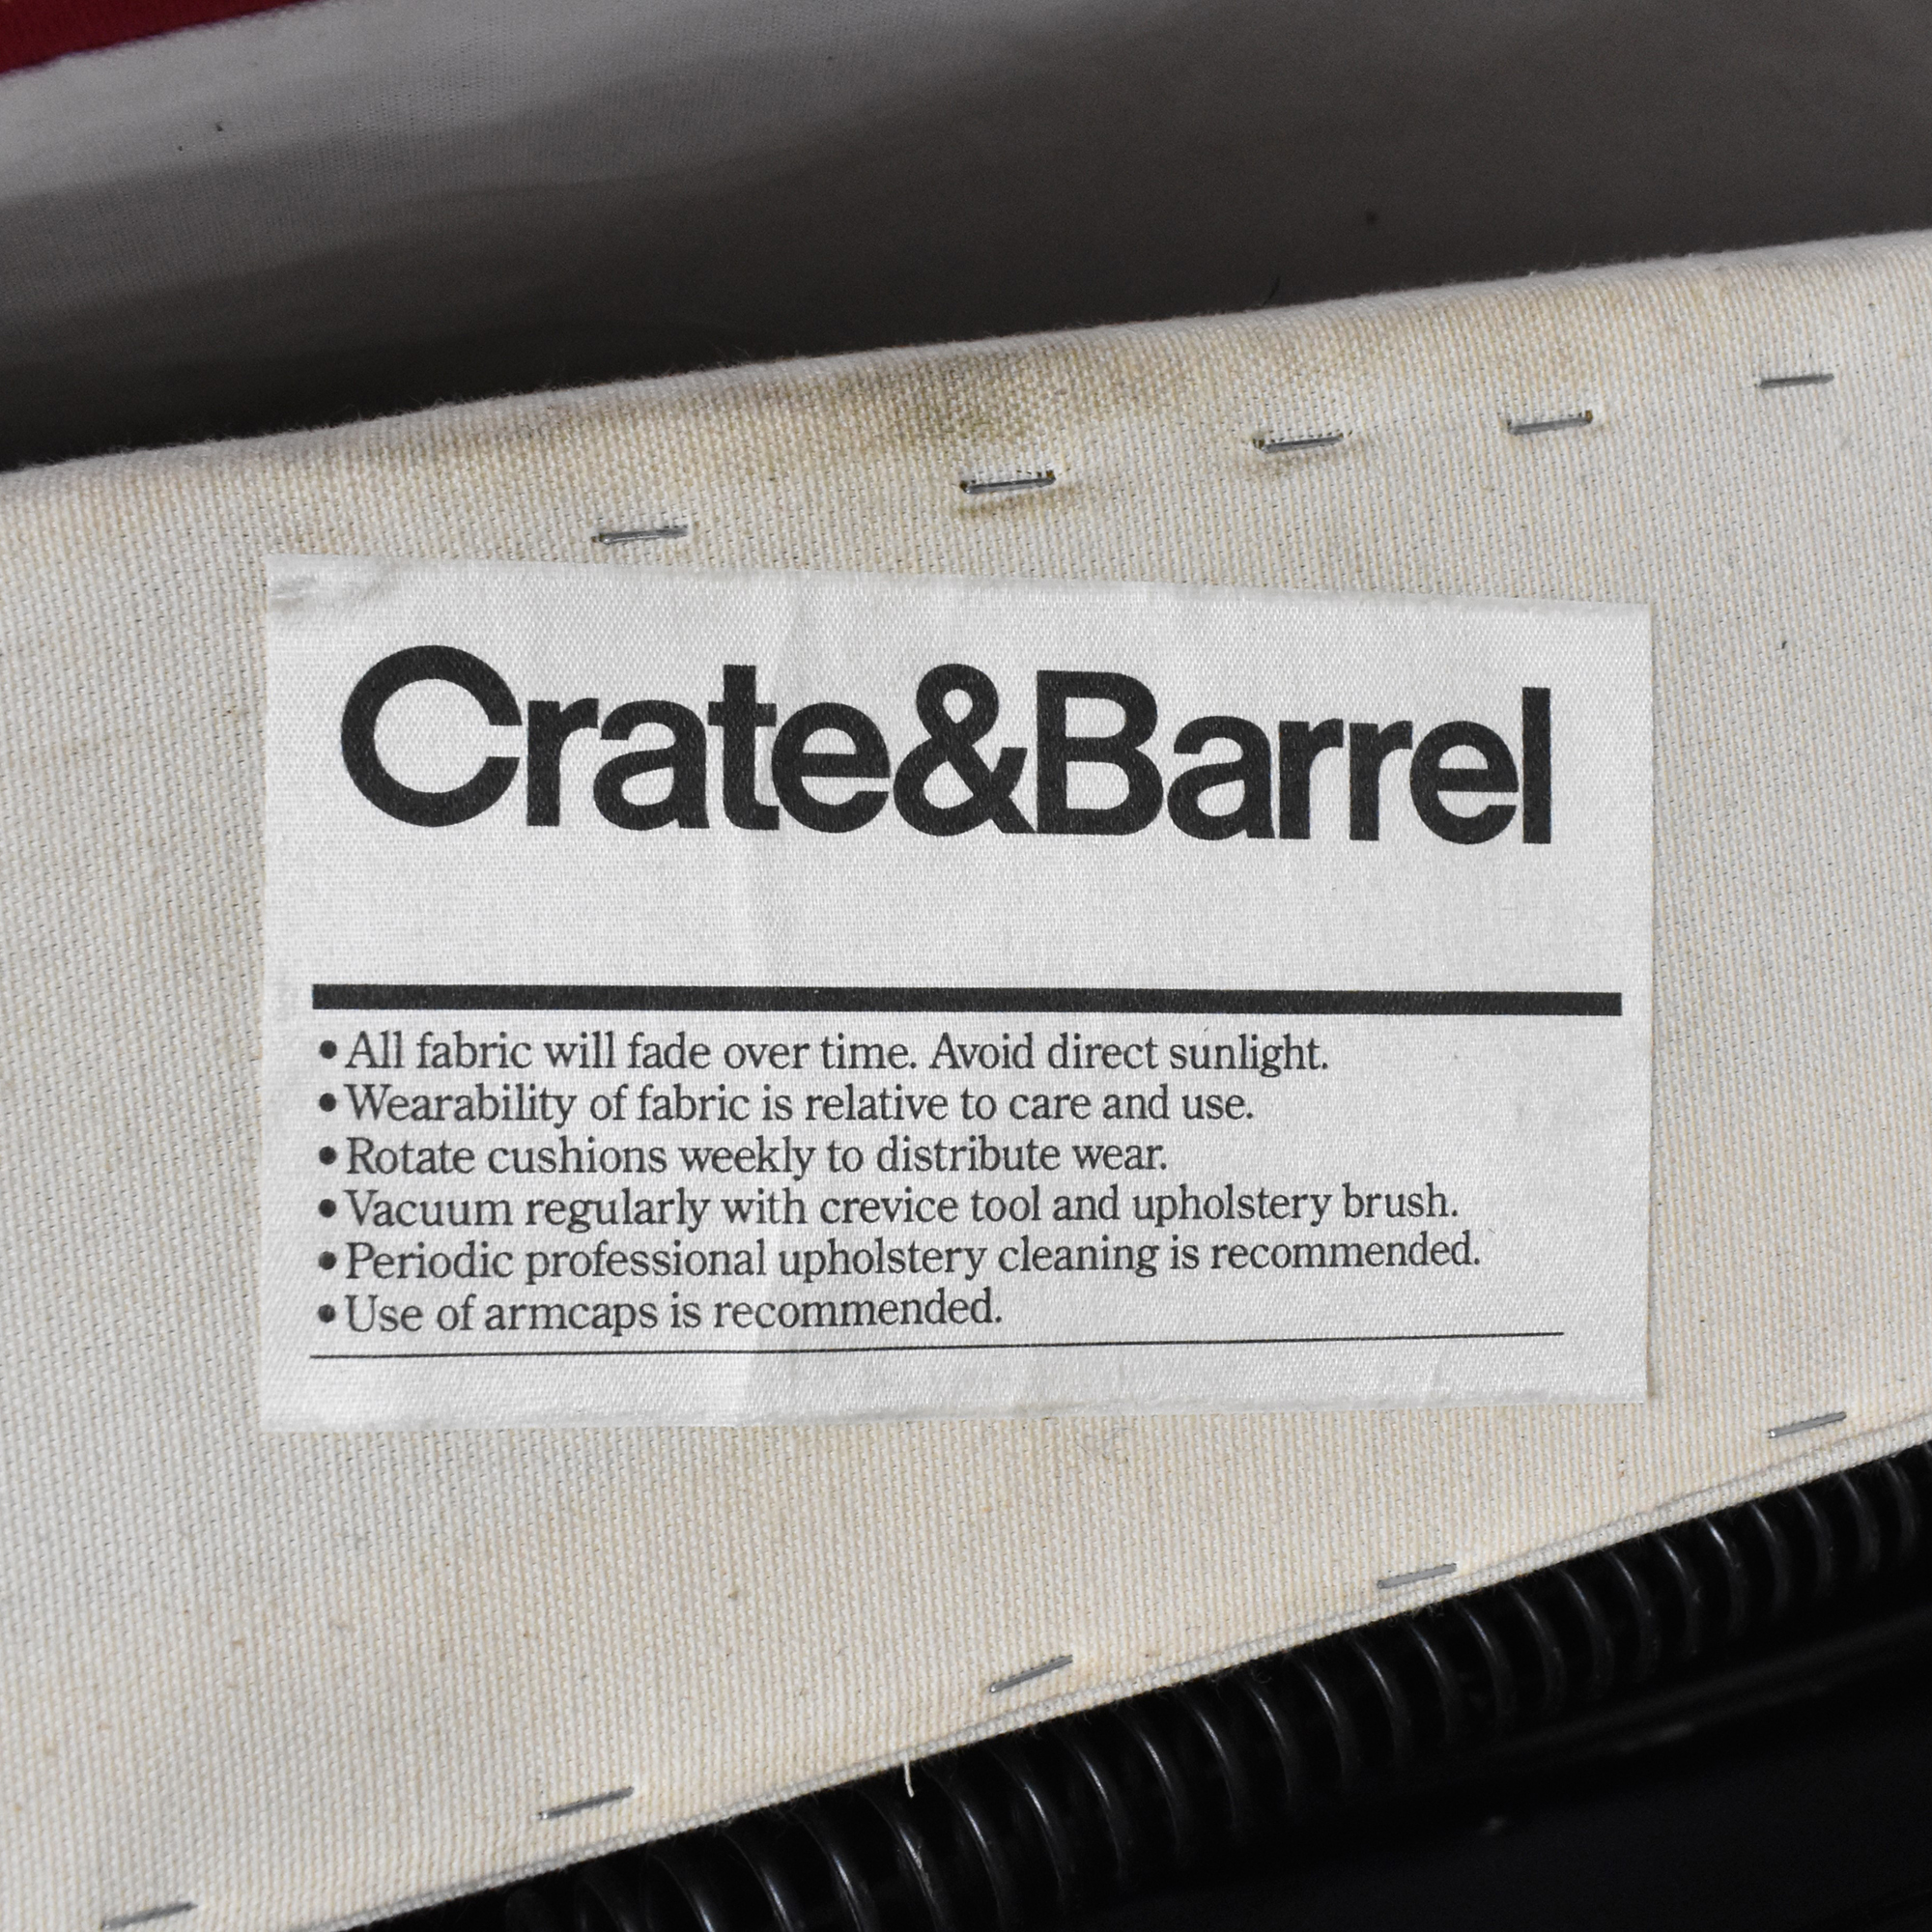 Crate & Barrel Crate & Barrel Roll Arm Slipcovered Sleeper Sofa Sofa Beds